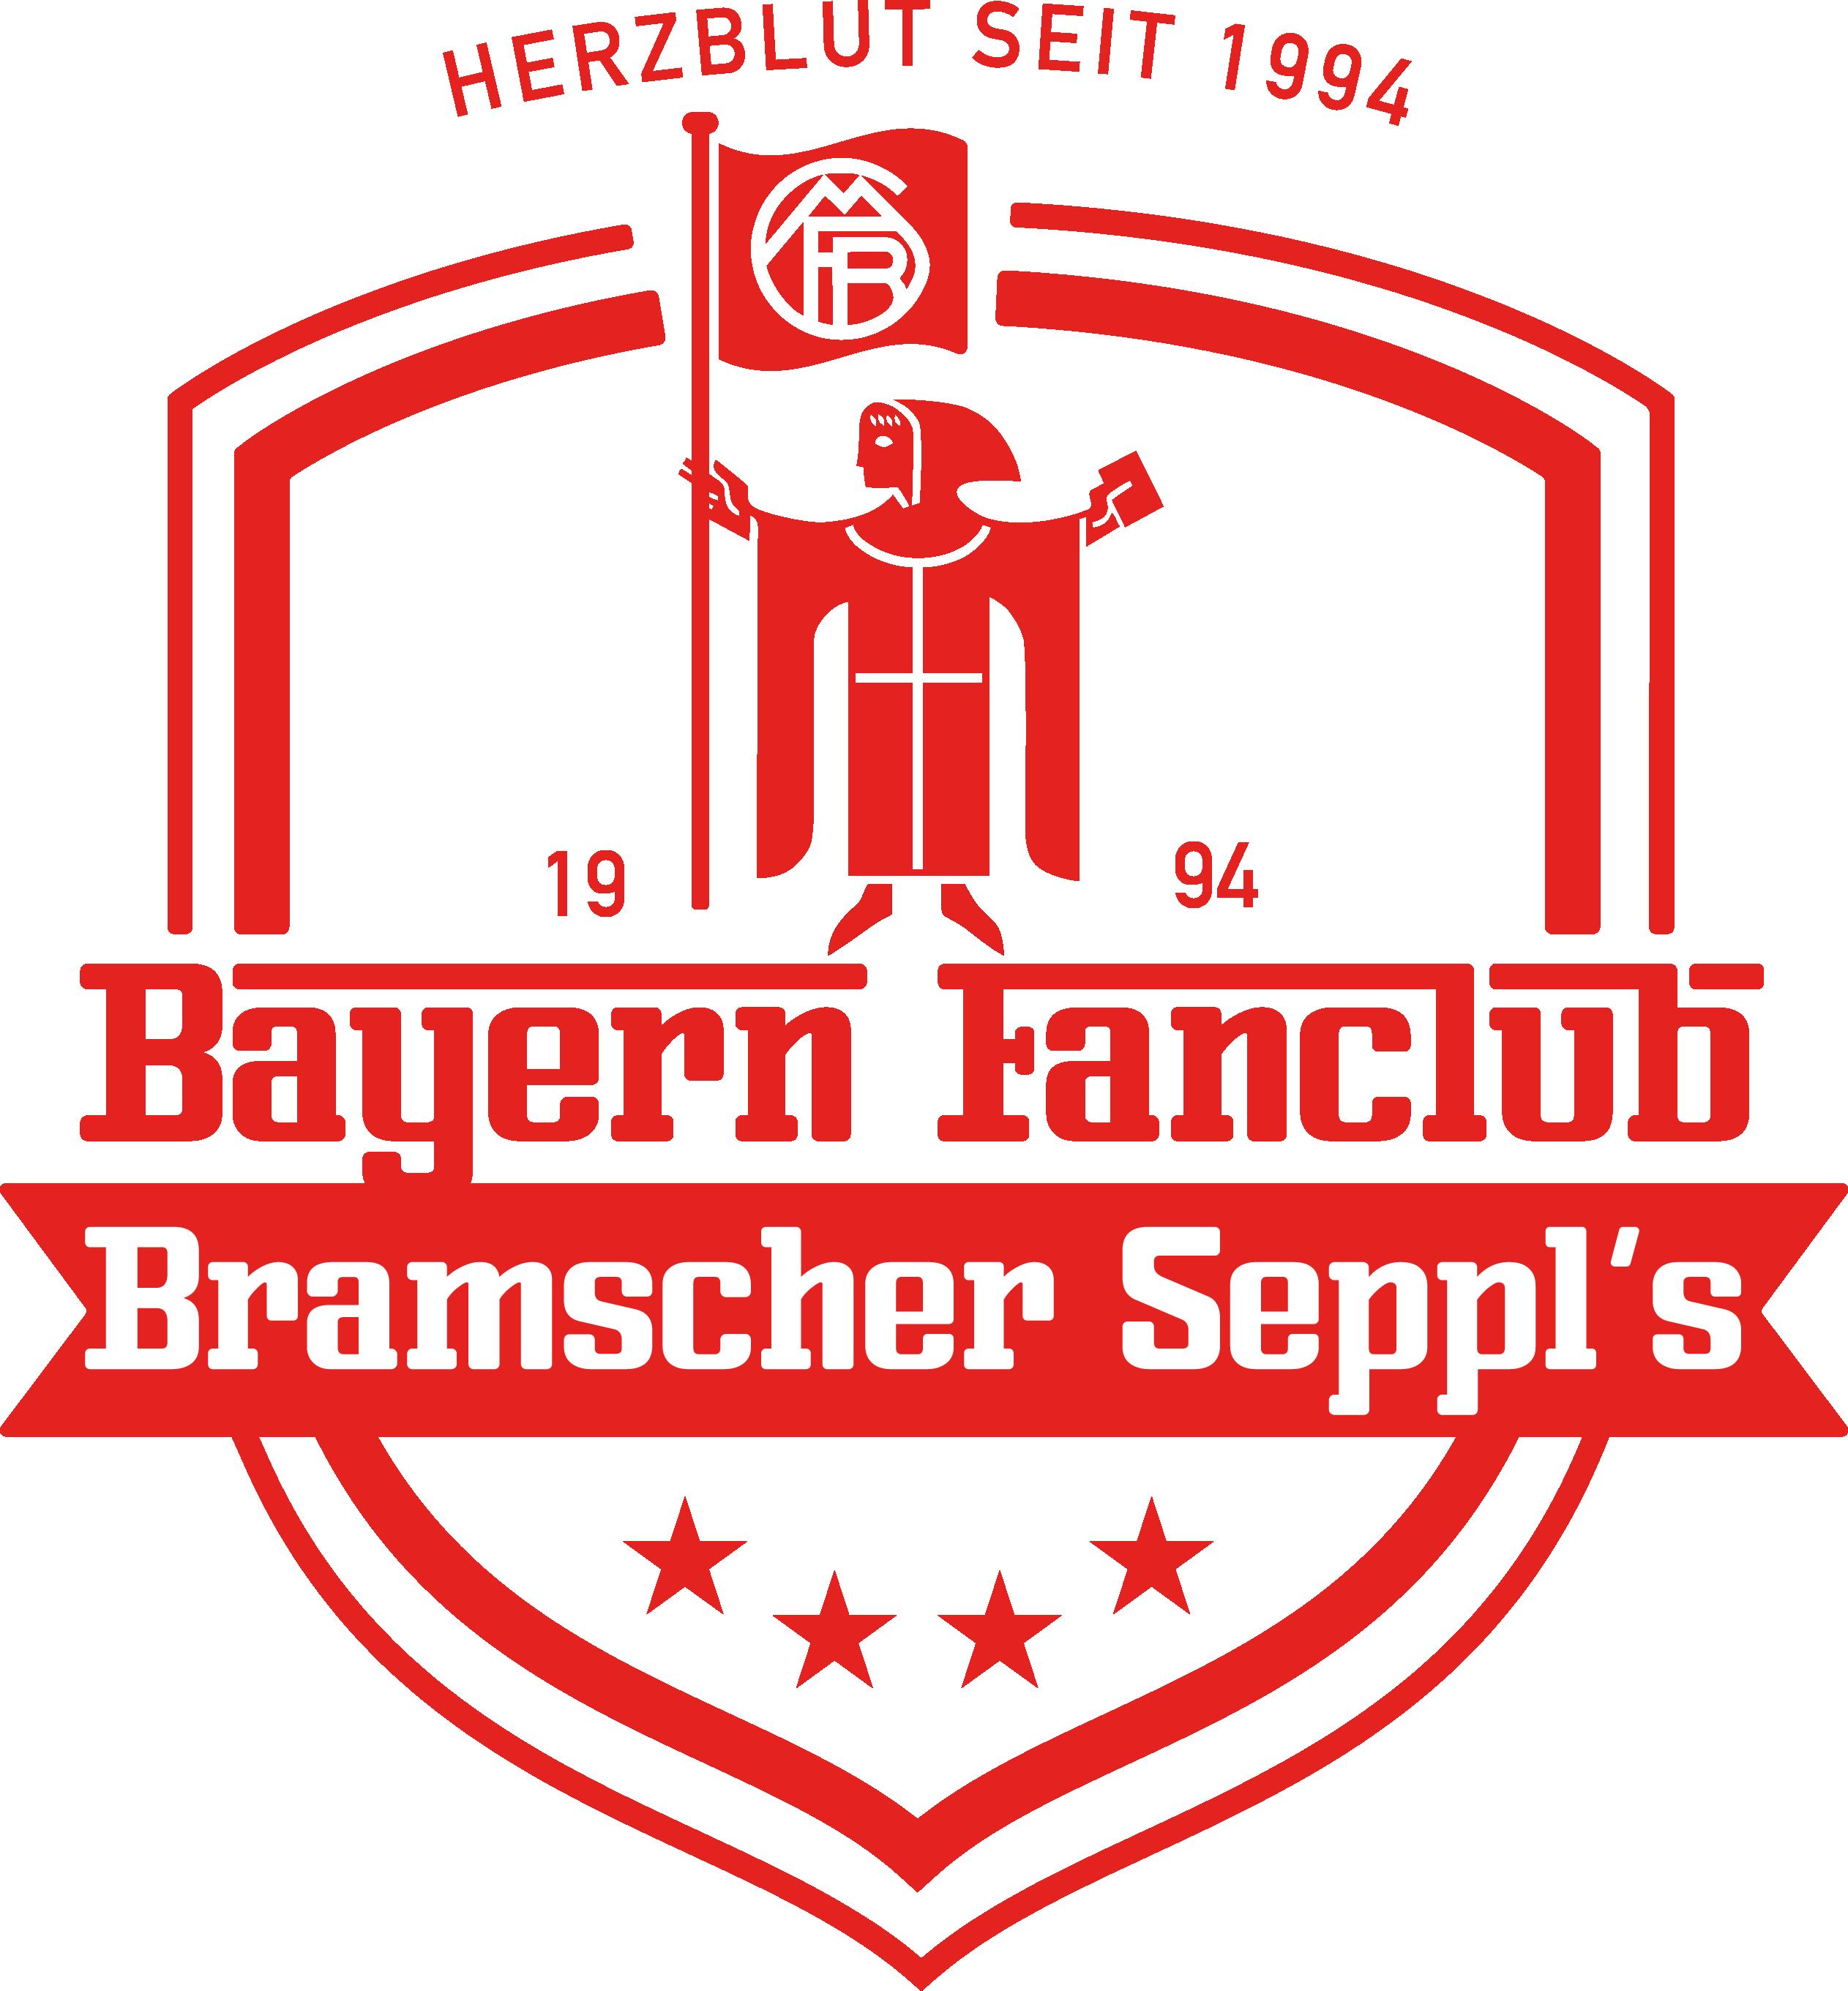 Bramscher-Seppls